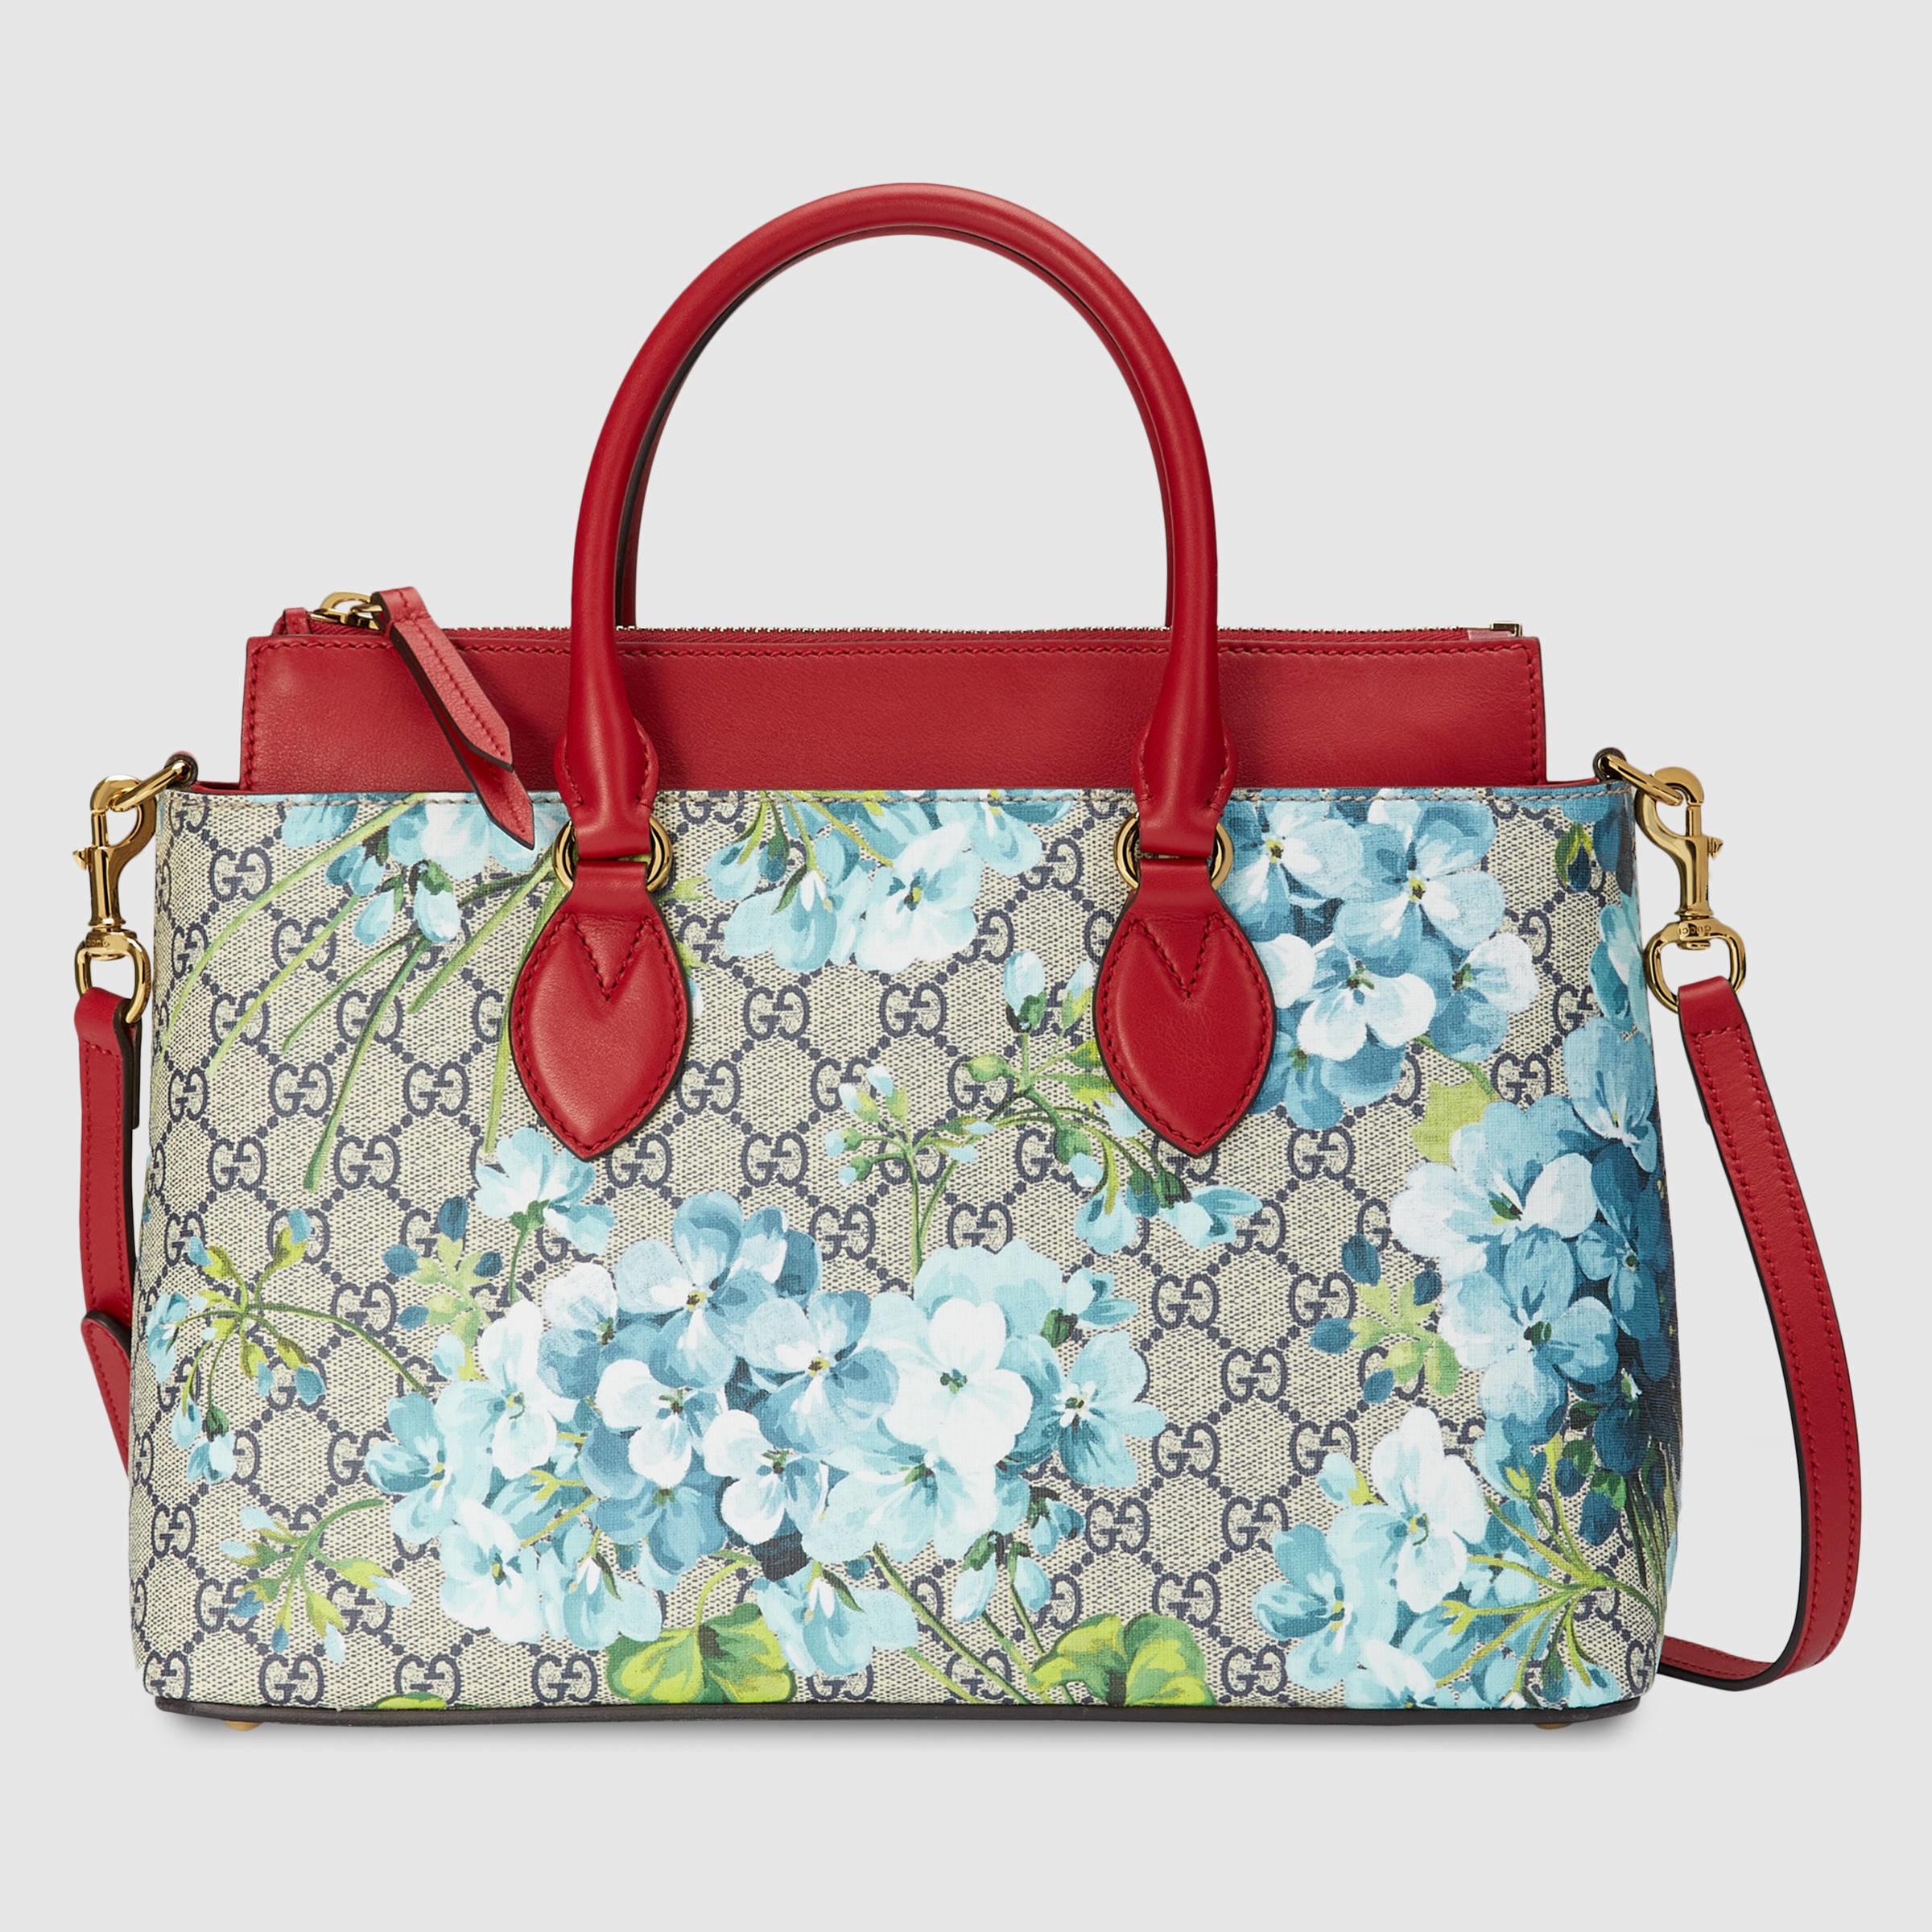 b3752dbffe2 Lyst - Gucci Gg Blooms Tote in Blue